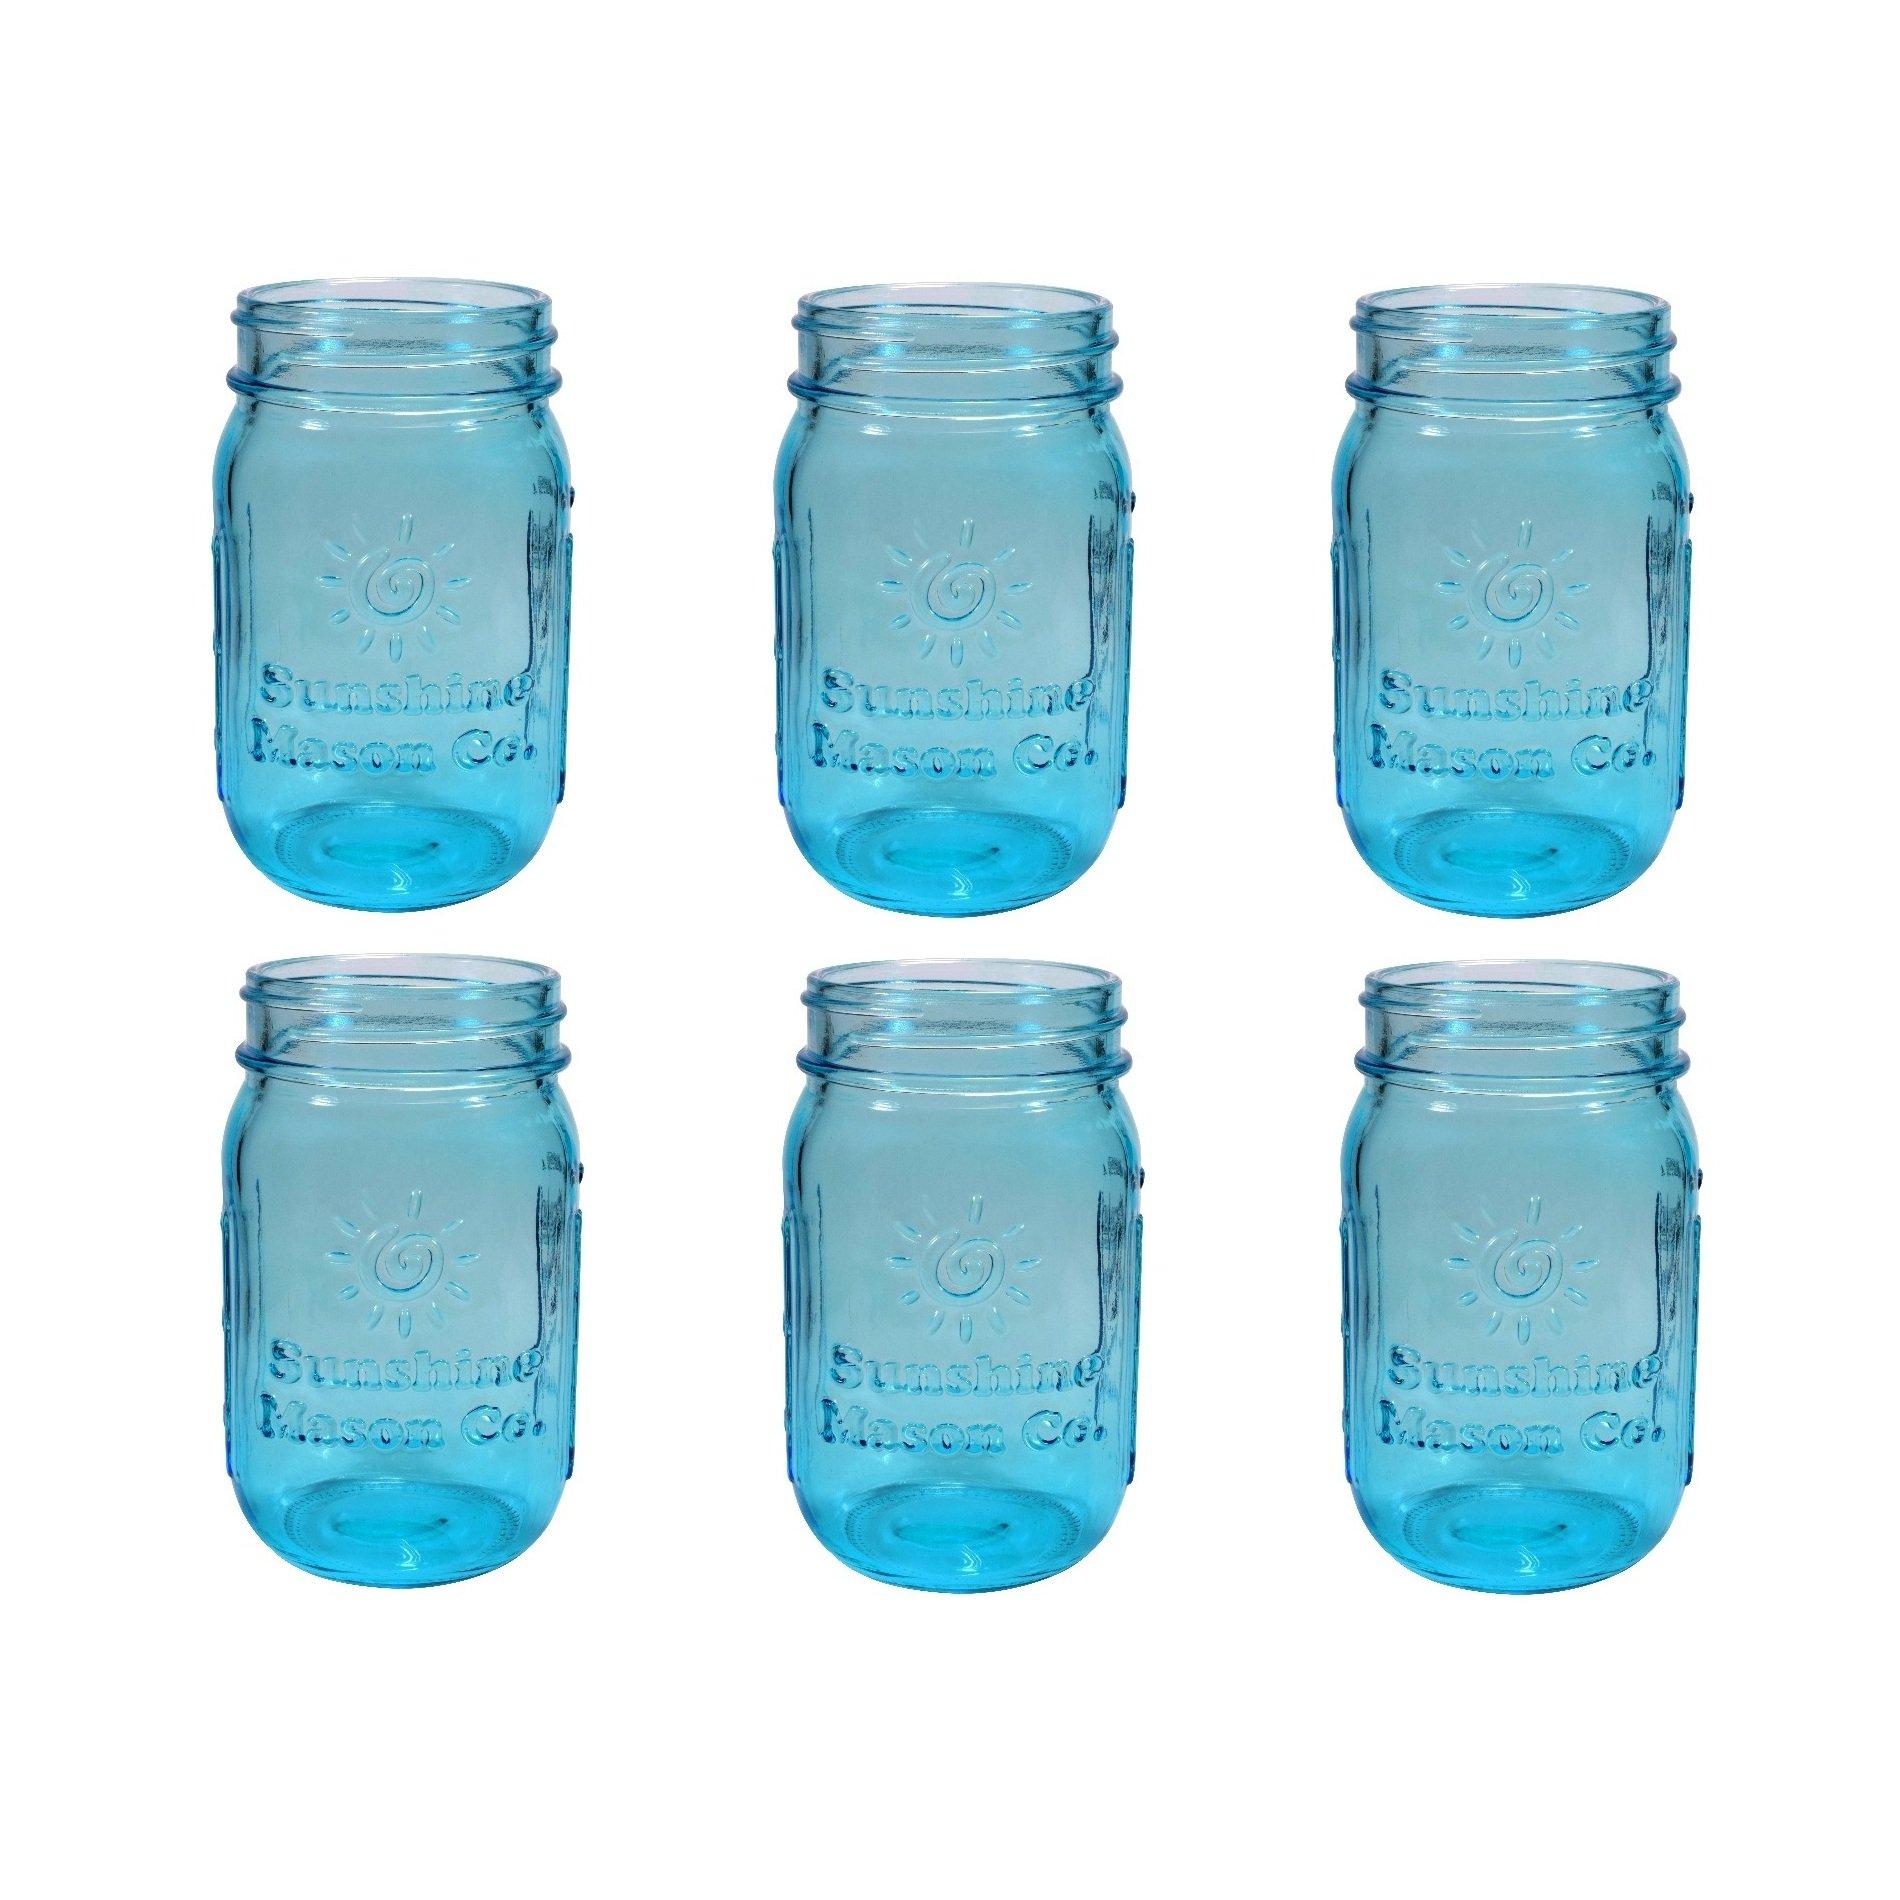 Sunshine Mason Co. Pint Sized Regular Mouth Glass Mason Jars Vintage Blue Color 6 Pack